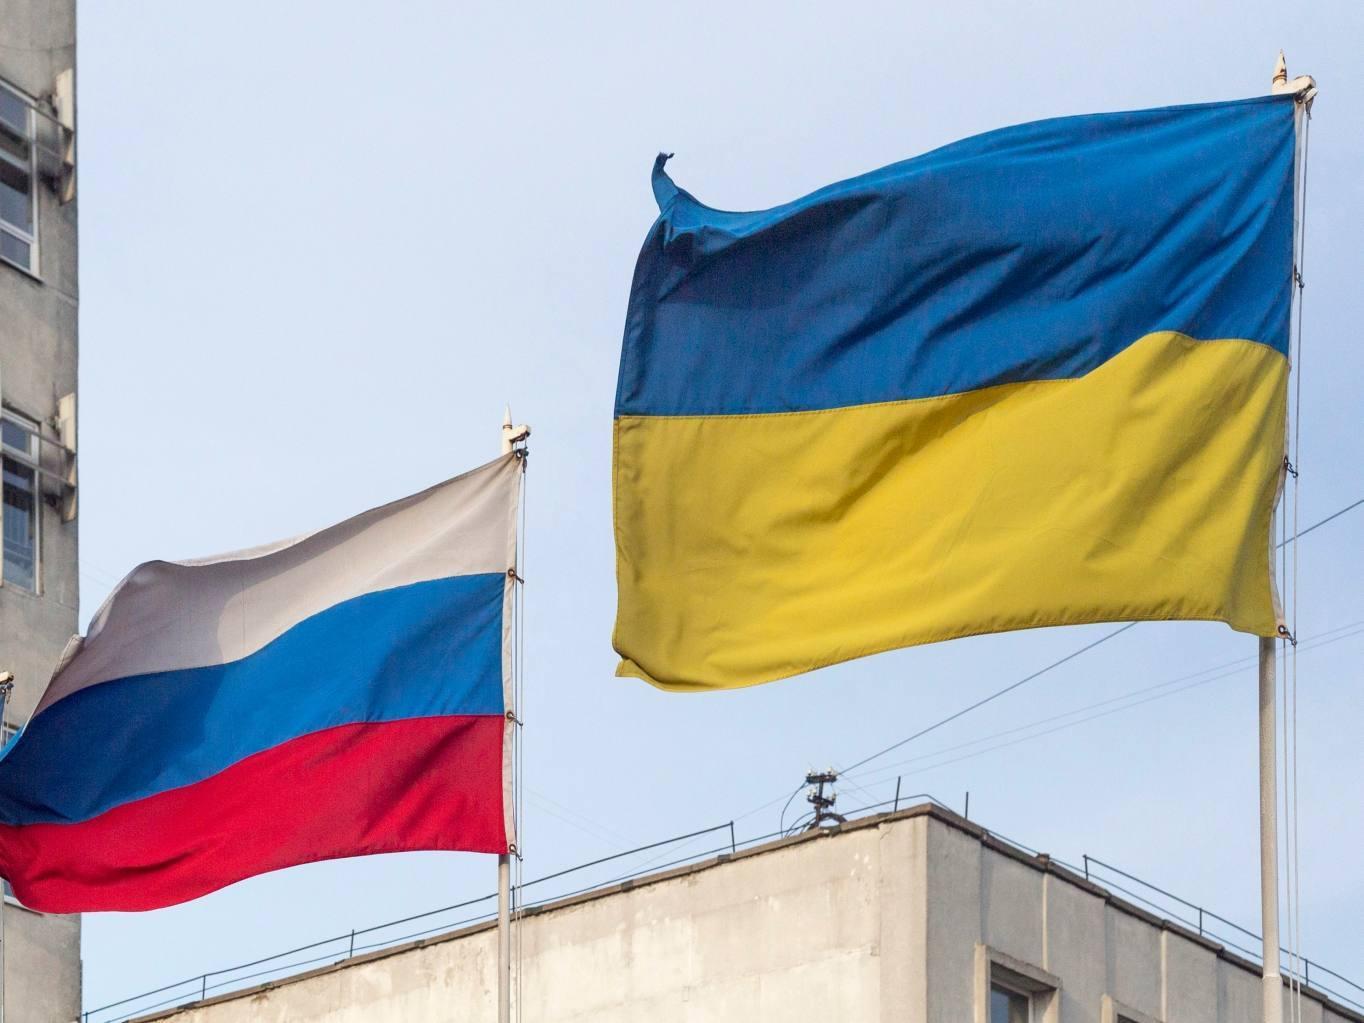 Rusya'dan Ukrayna'ya karşı-yaptırım